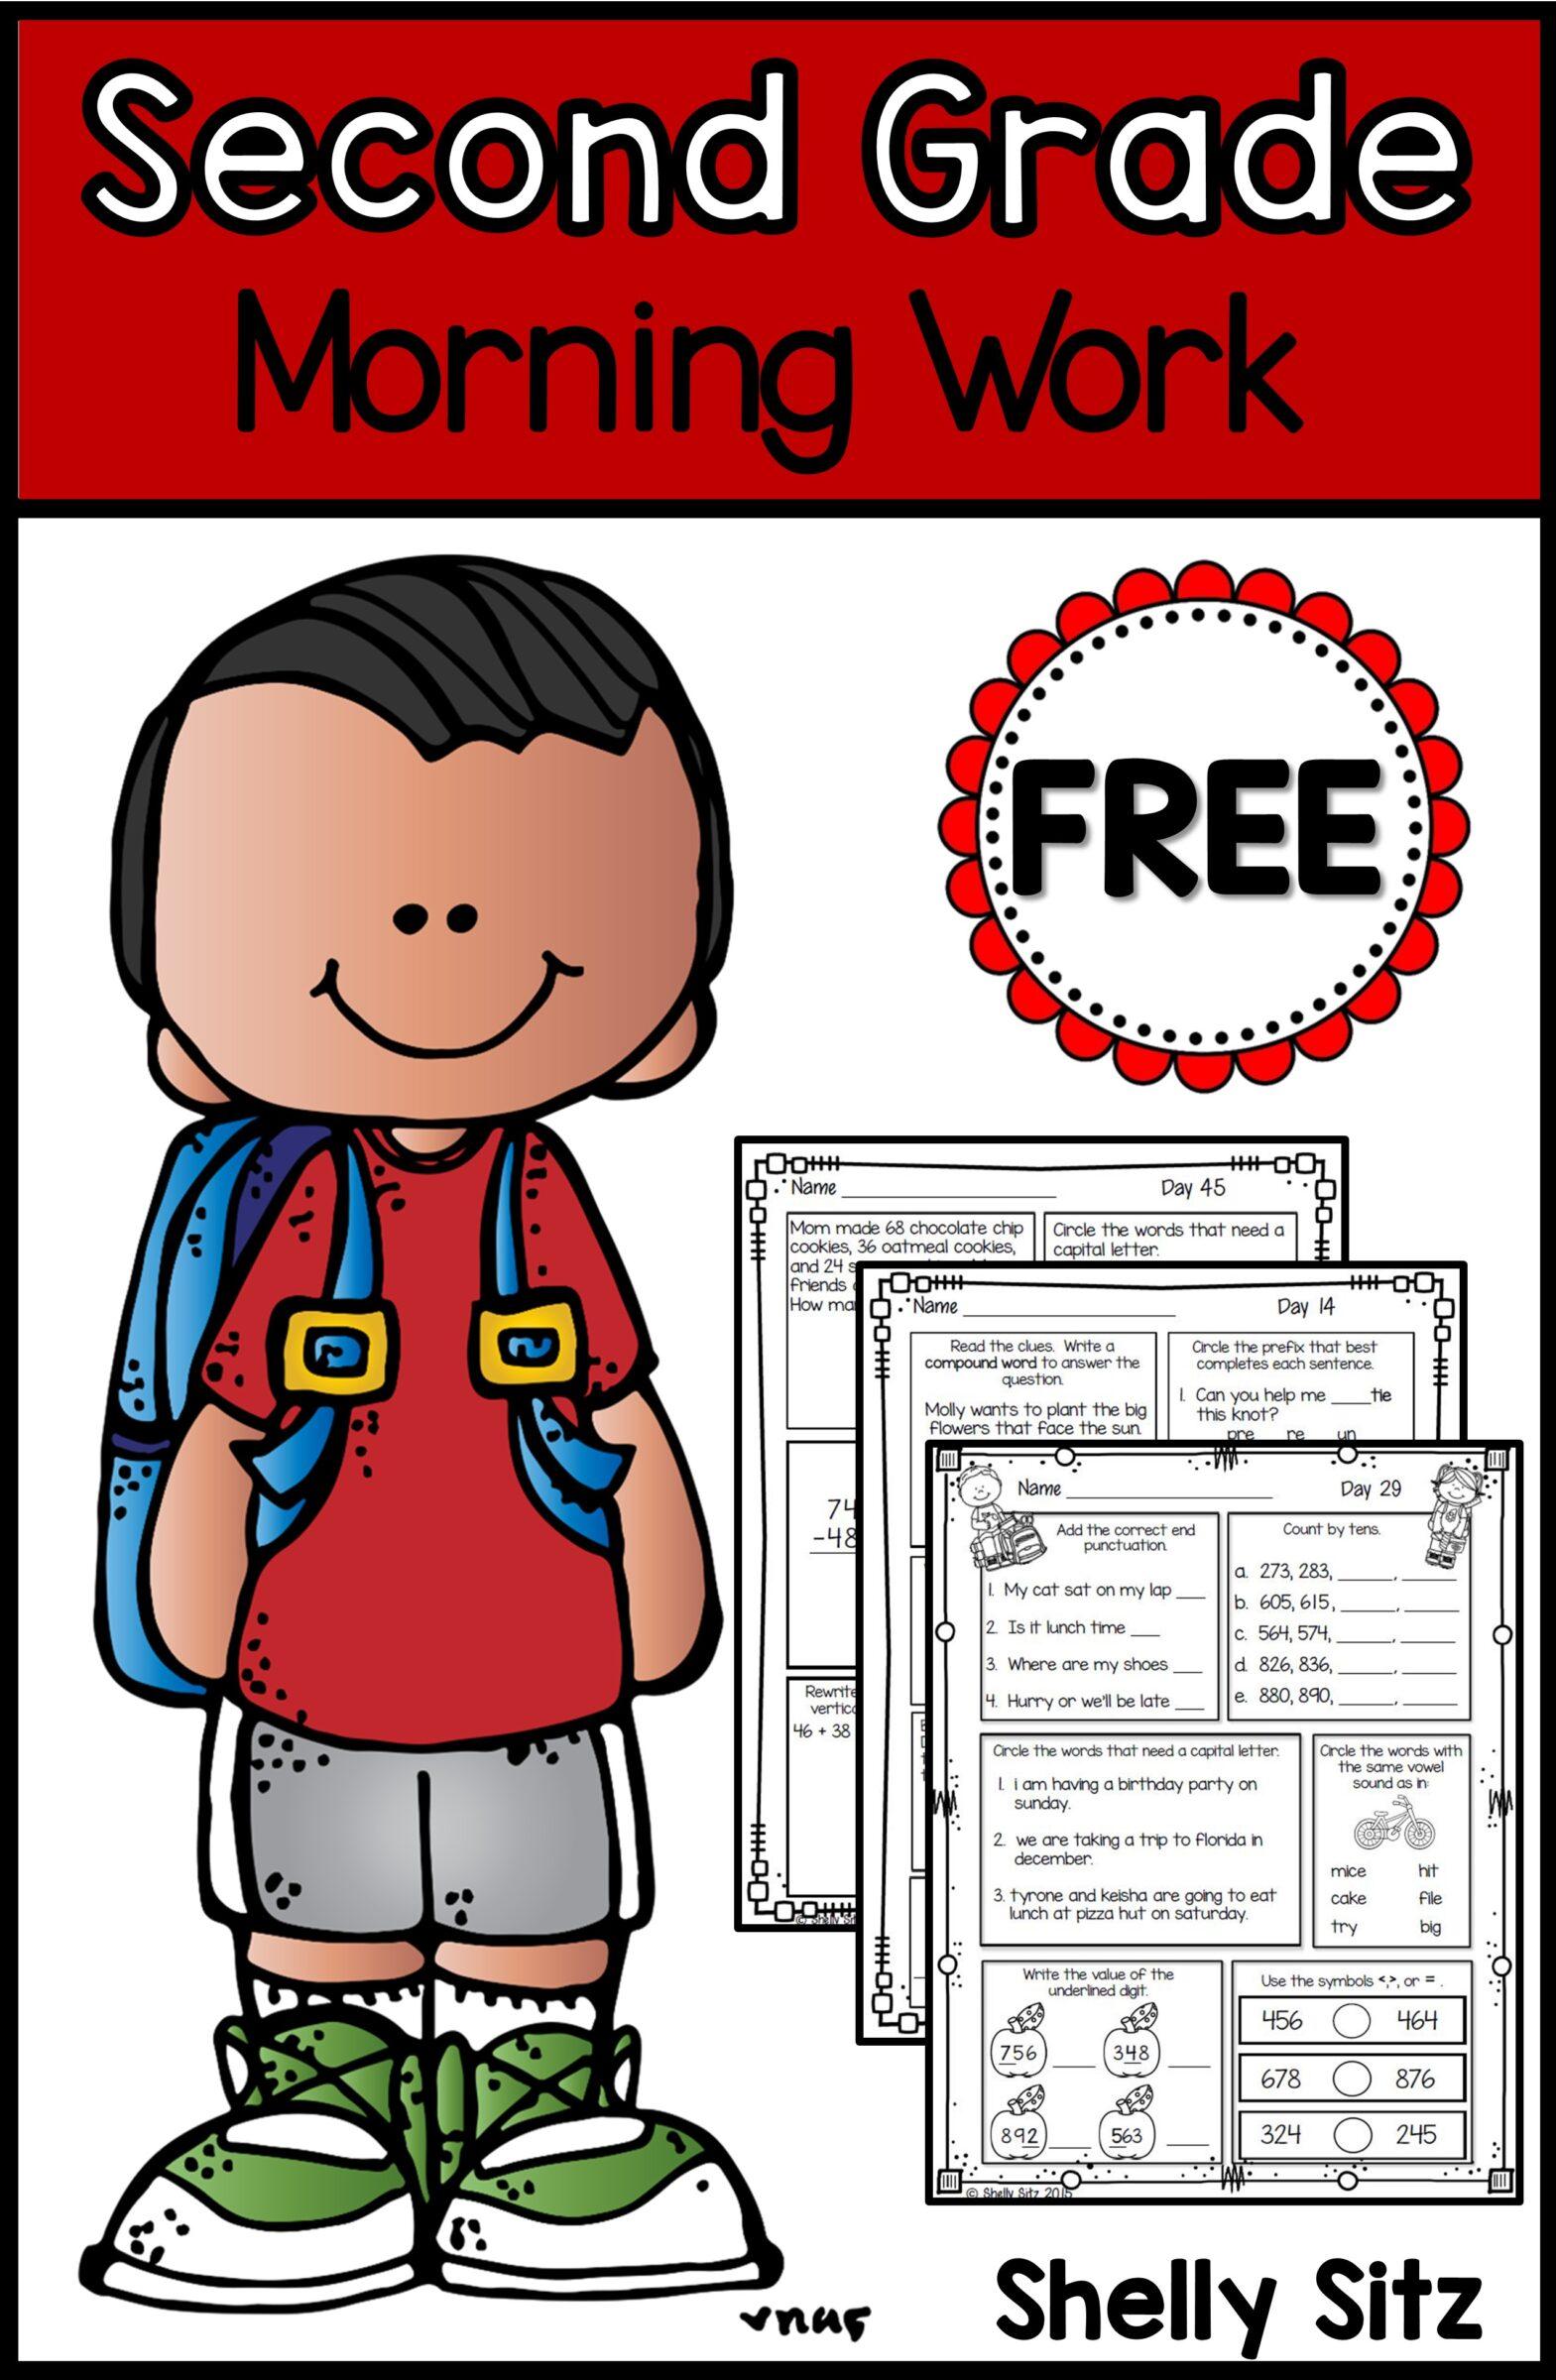 Free second grade morning work